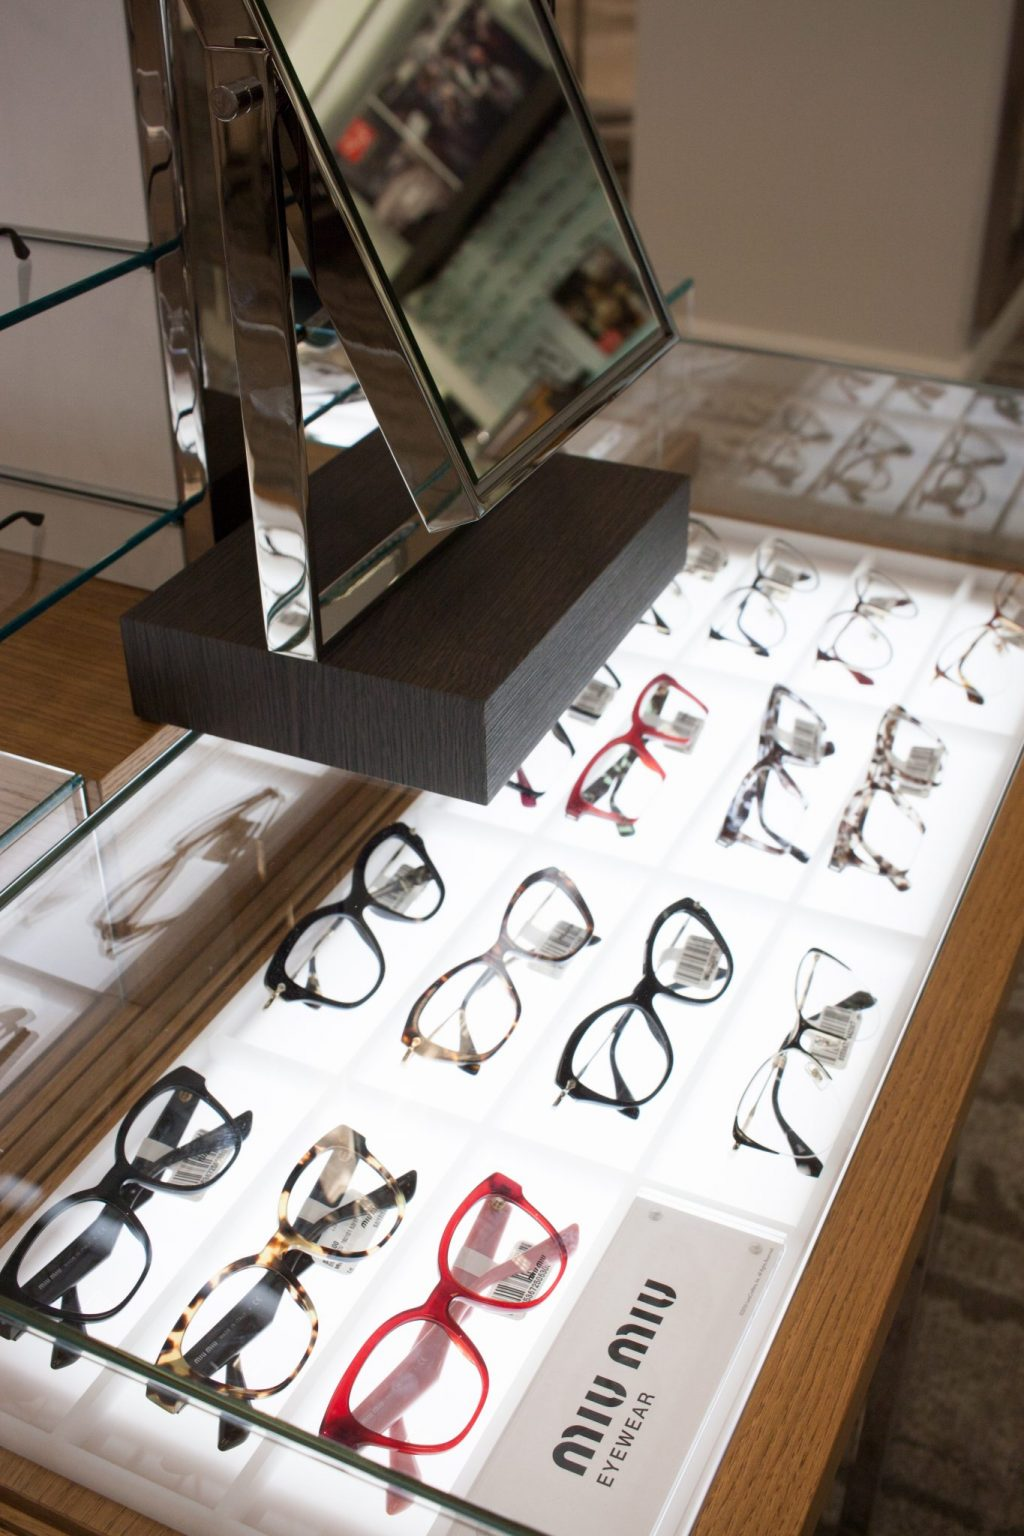 lenscrafters in macys at lenox mall, lenscrafters atlanta, luxottica, prada frames, designer prescription glasses, stylish glasses frames, eye exams in atlanta, eye doctors in atlanta, plastic and wire frames, plastic and metal frames, PRADA PR 55SV CINEMA